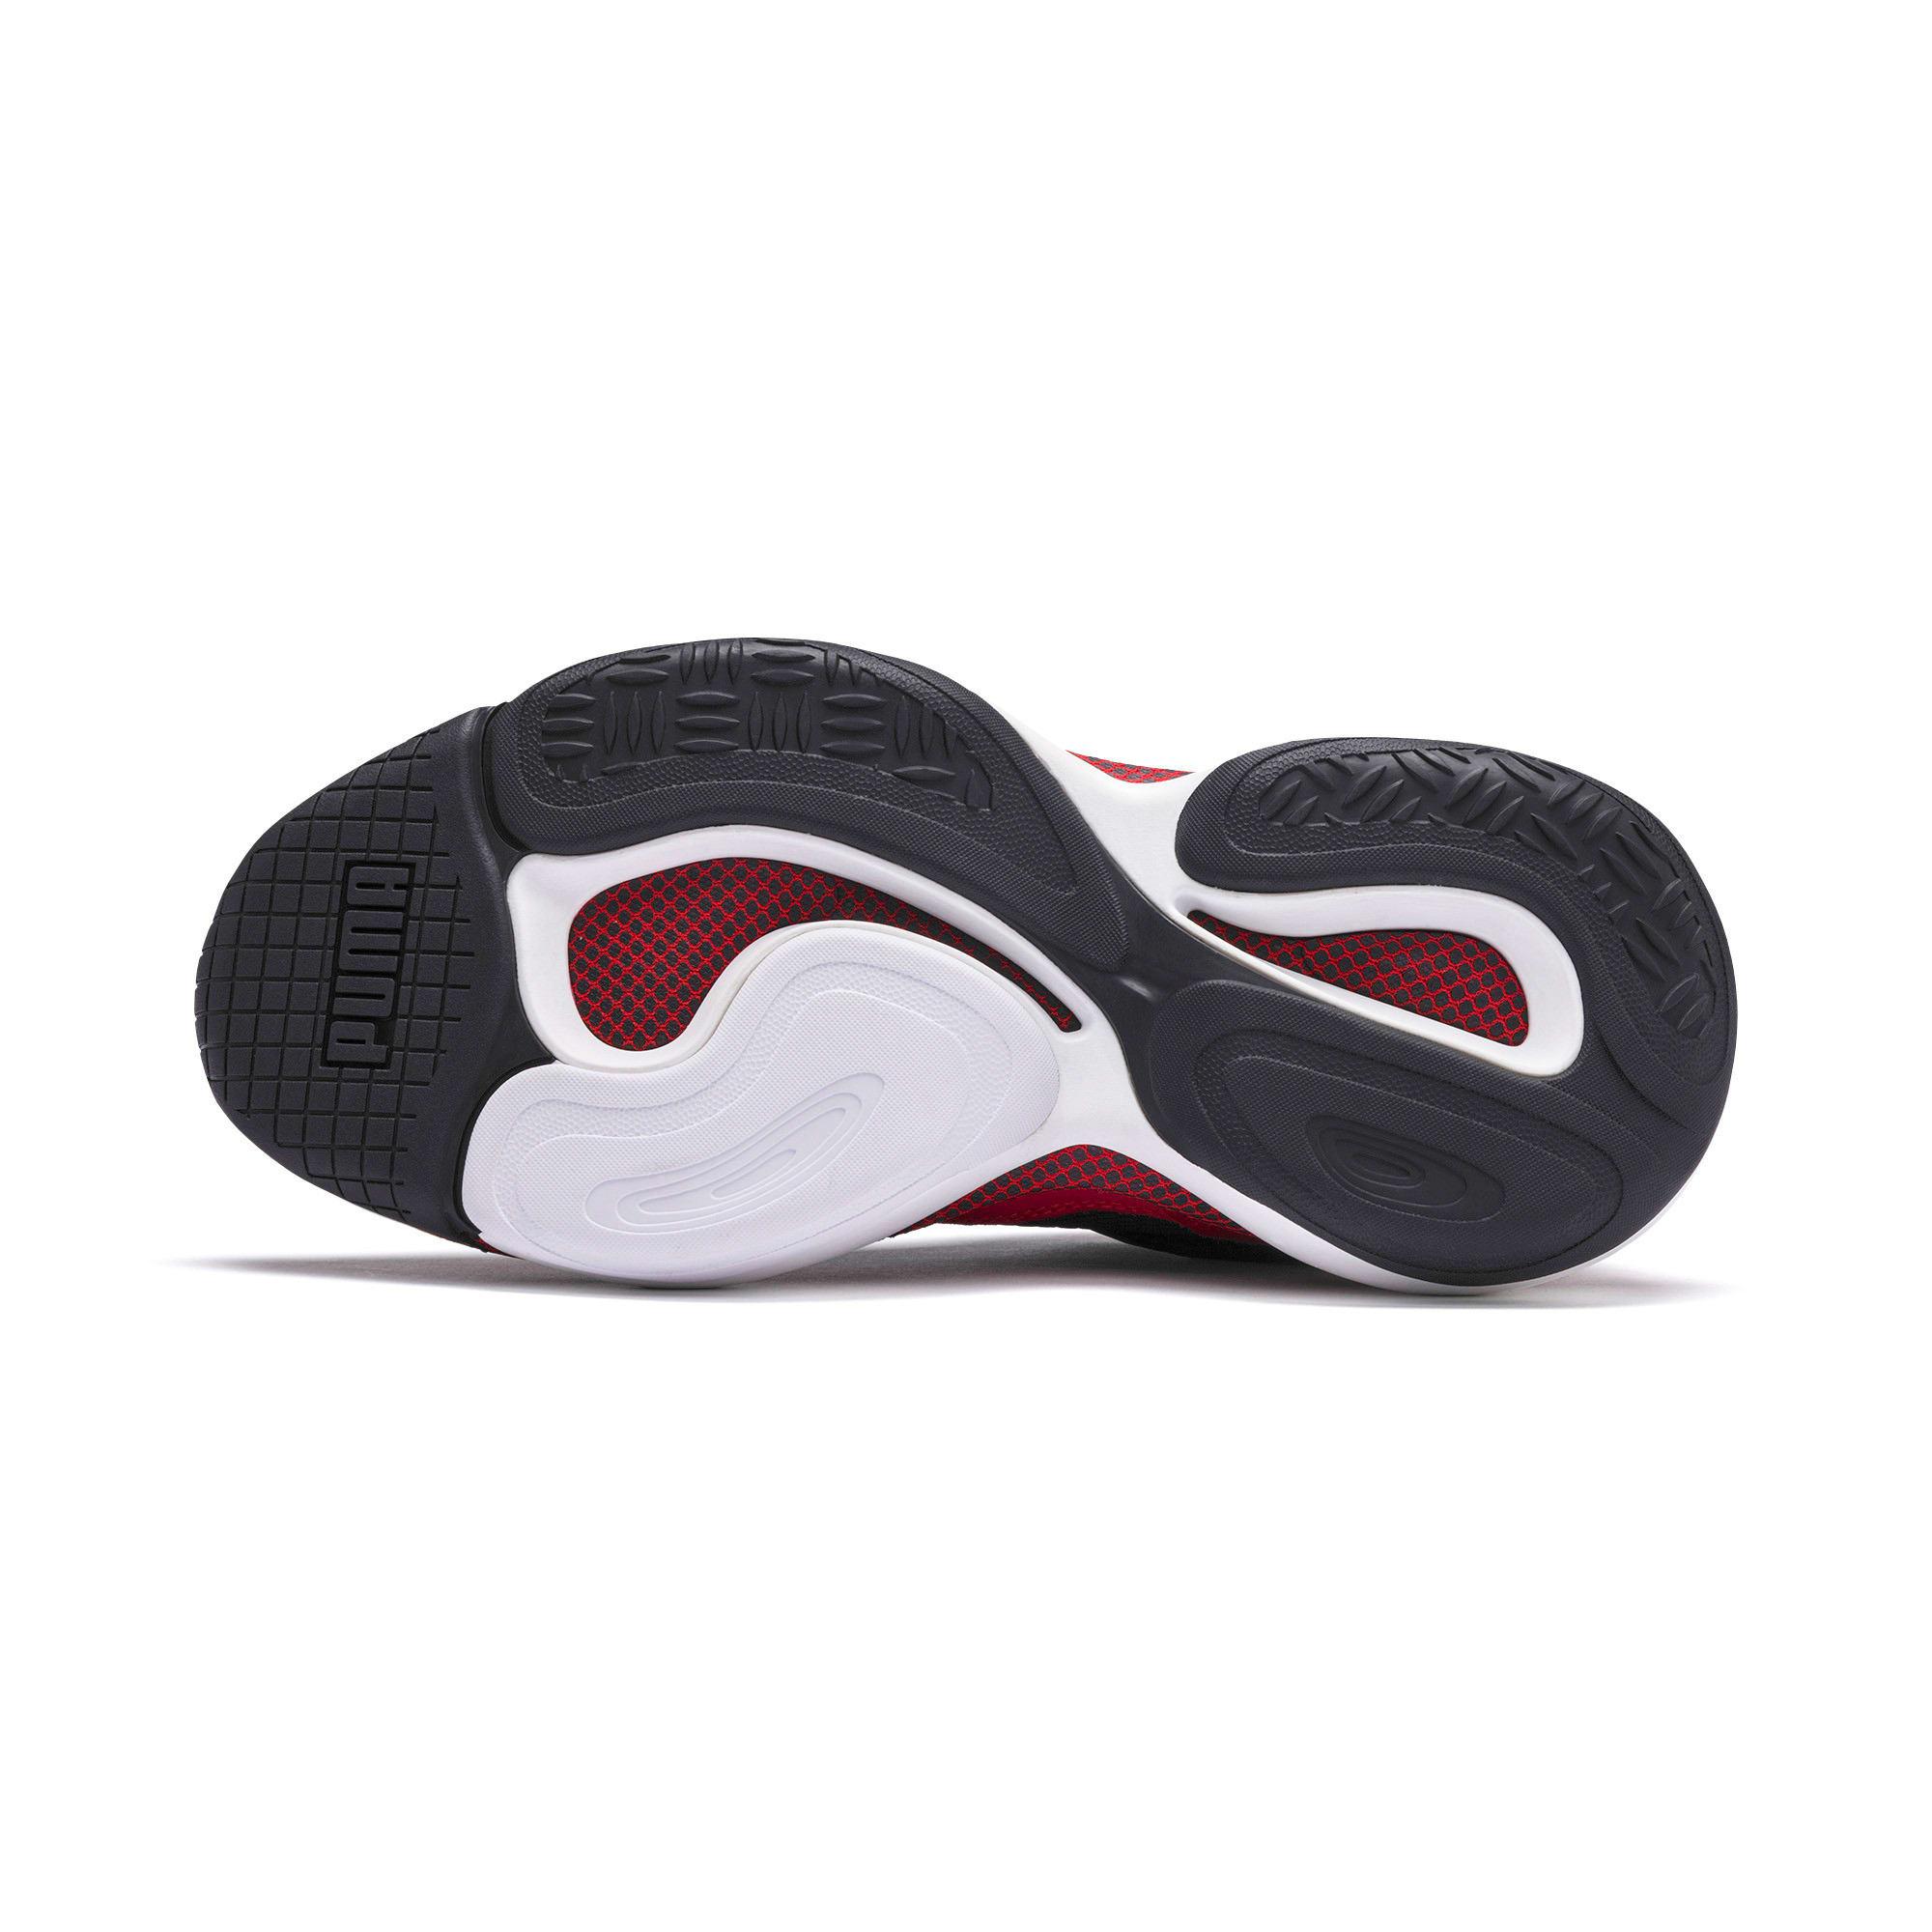 Thumbnail 5 of Alteration Blitz Sneakers, Puma Black-High Risk Red, medium